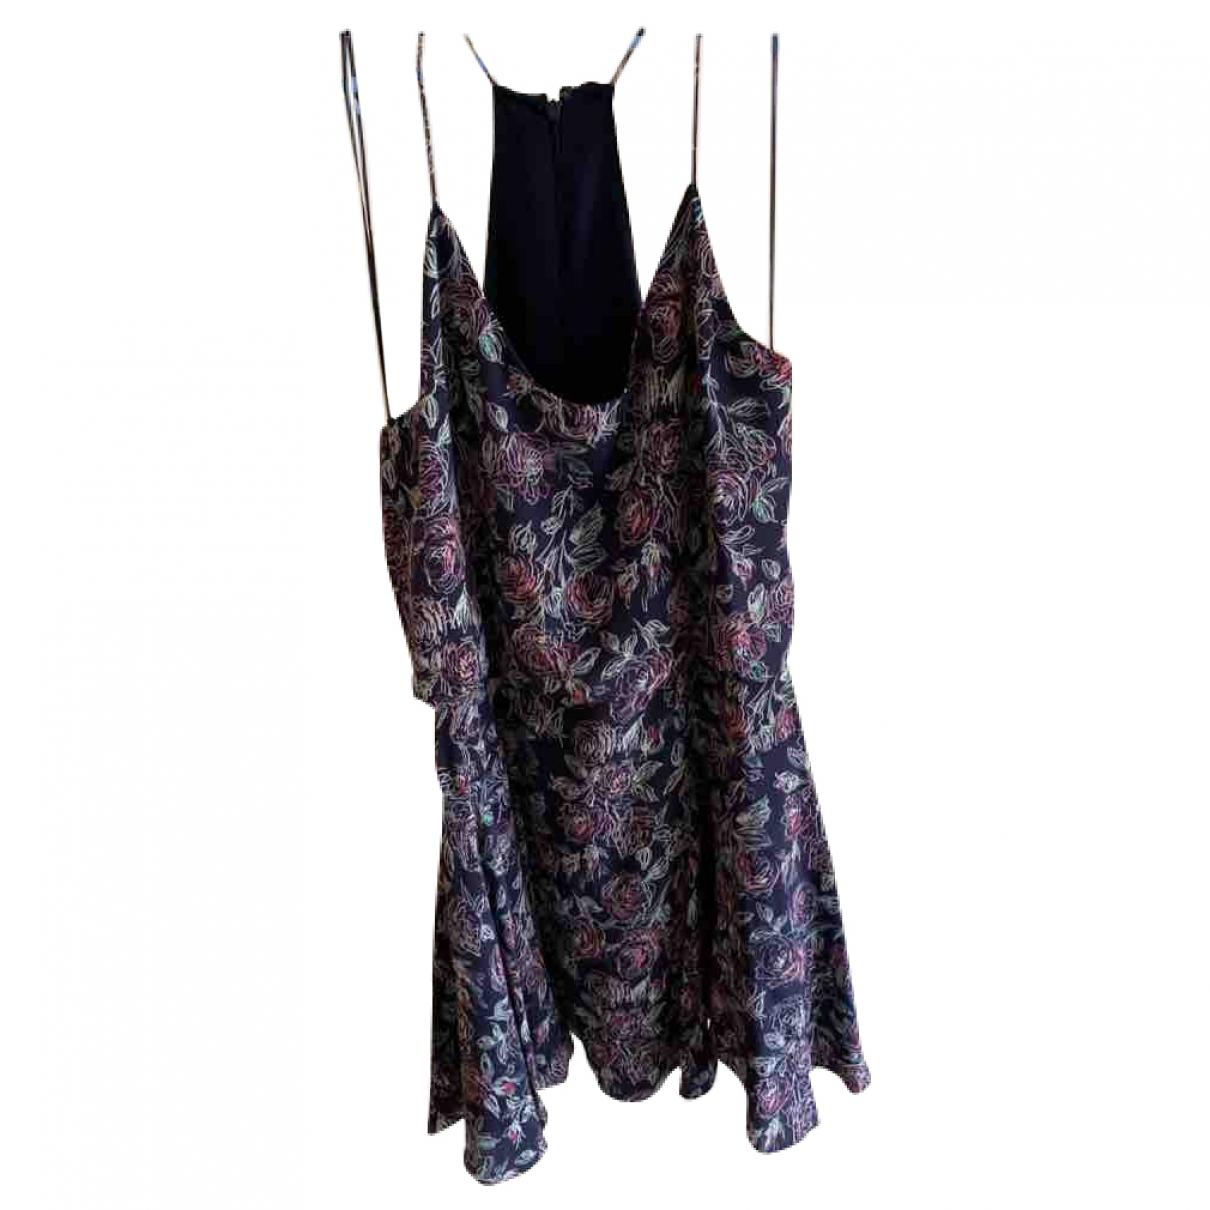 Joie \N Silk dress for Women M International